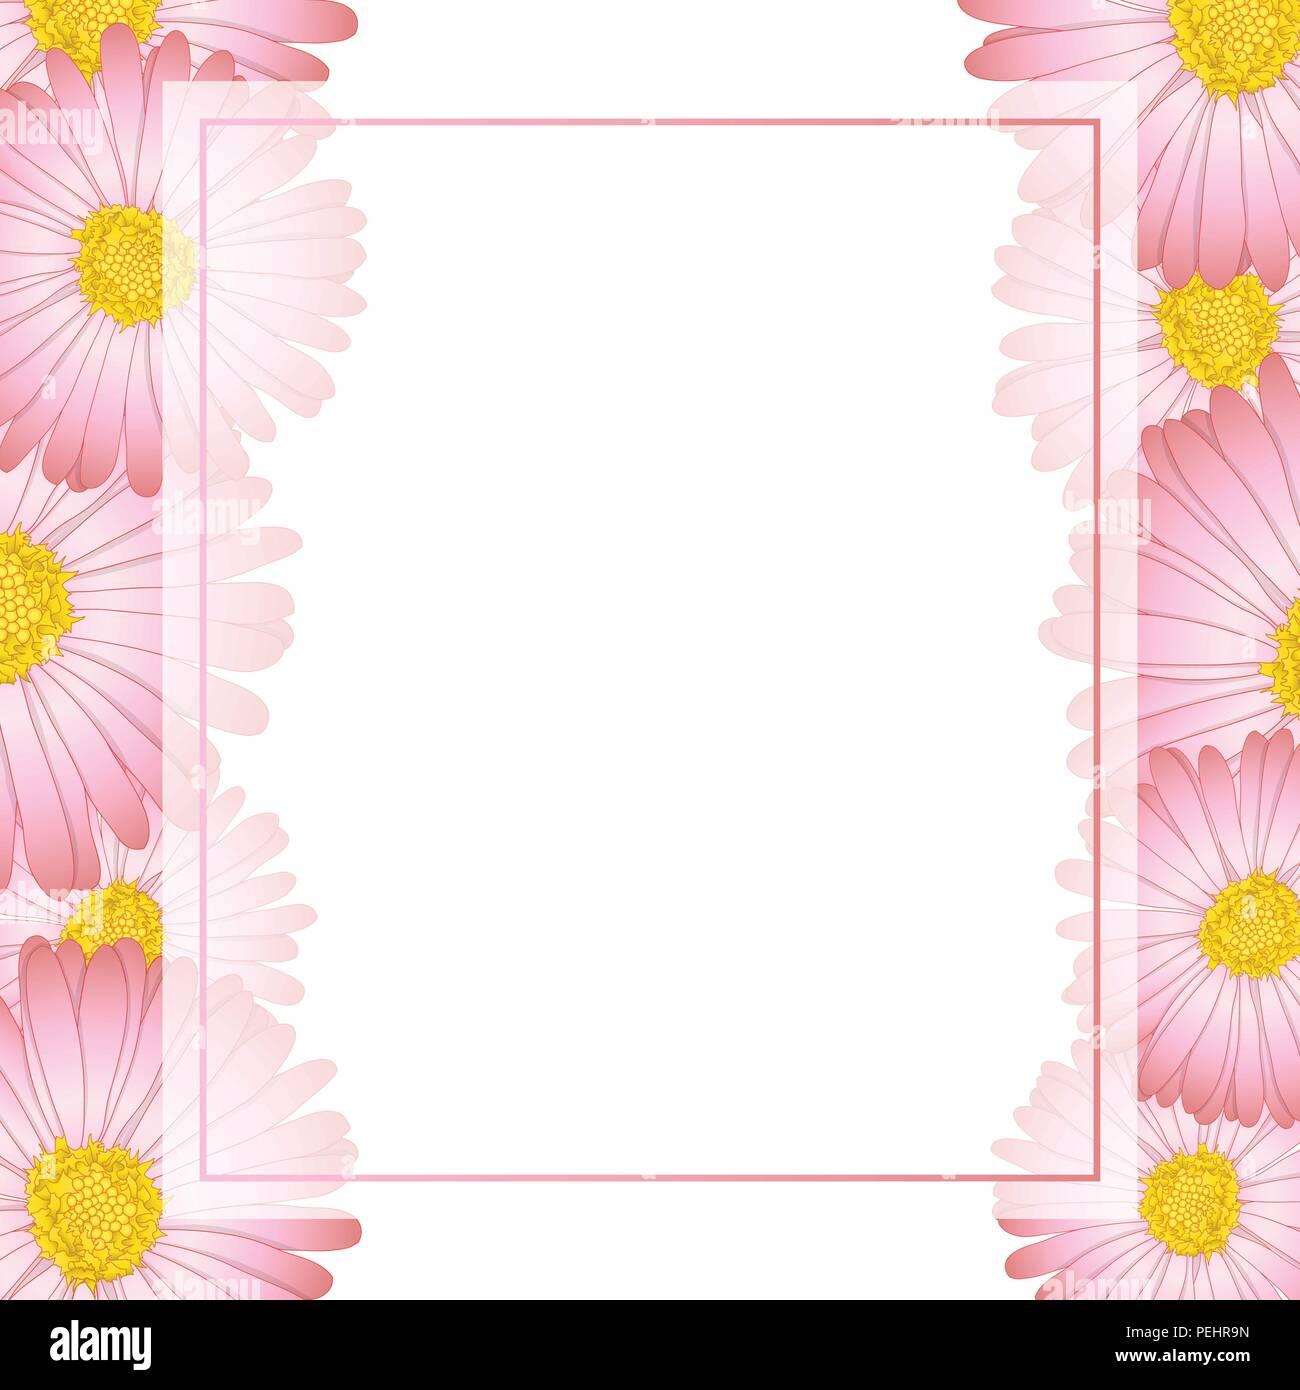 Pink aster daisy flower banner card border vector illustration pink aster daisy flower banner card border vector illustration izmirmasajfo